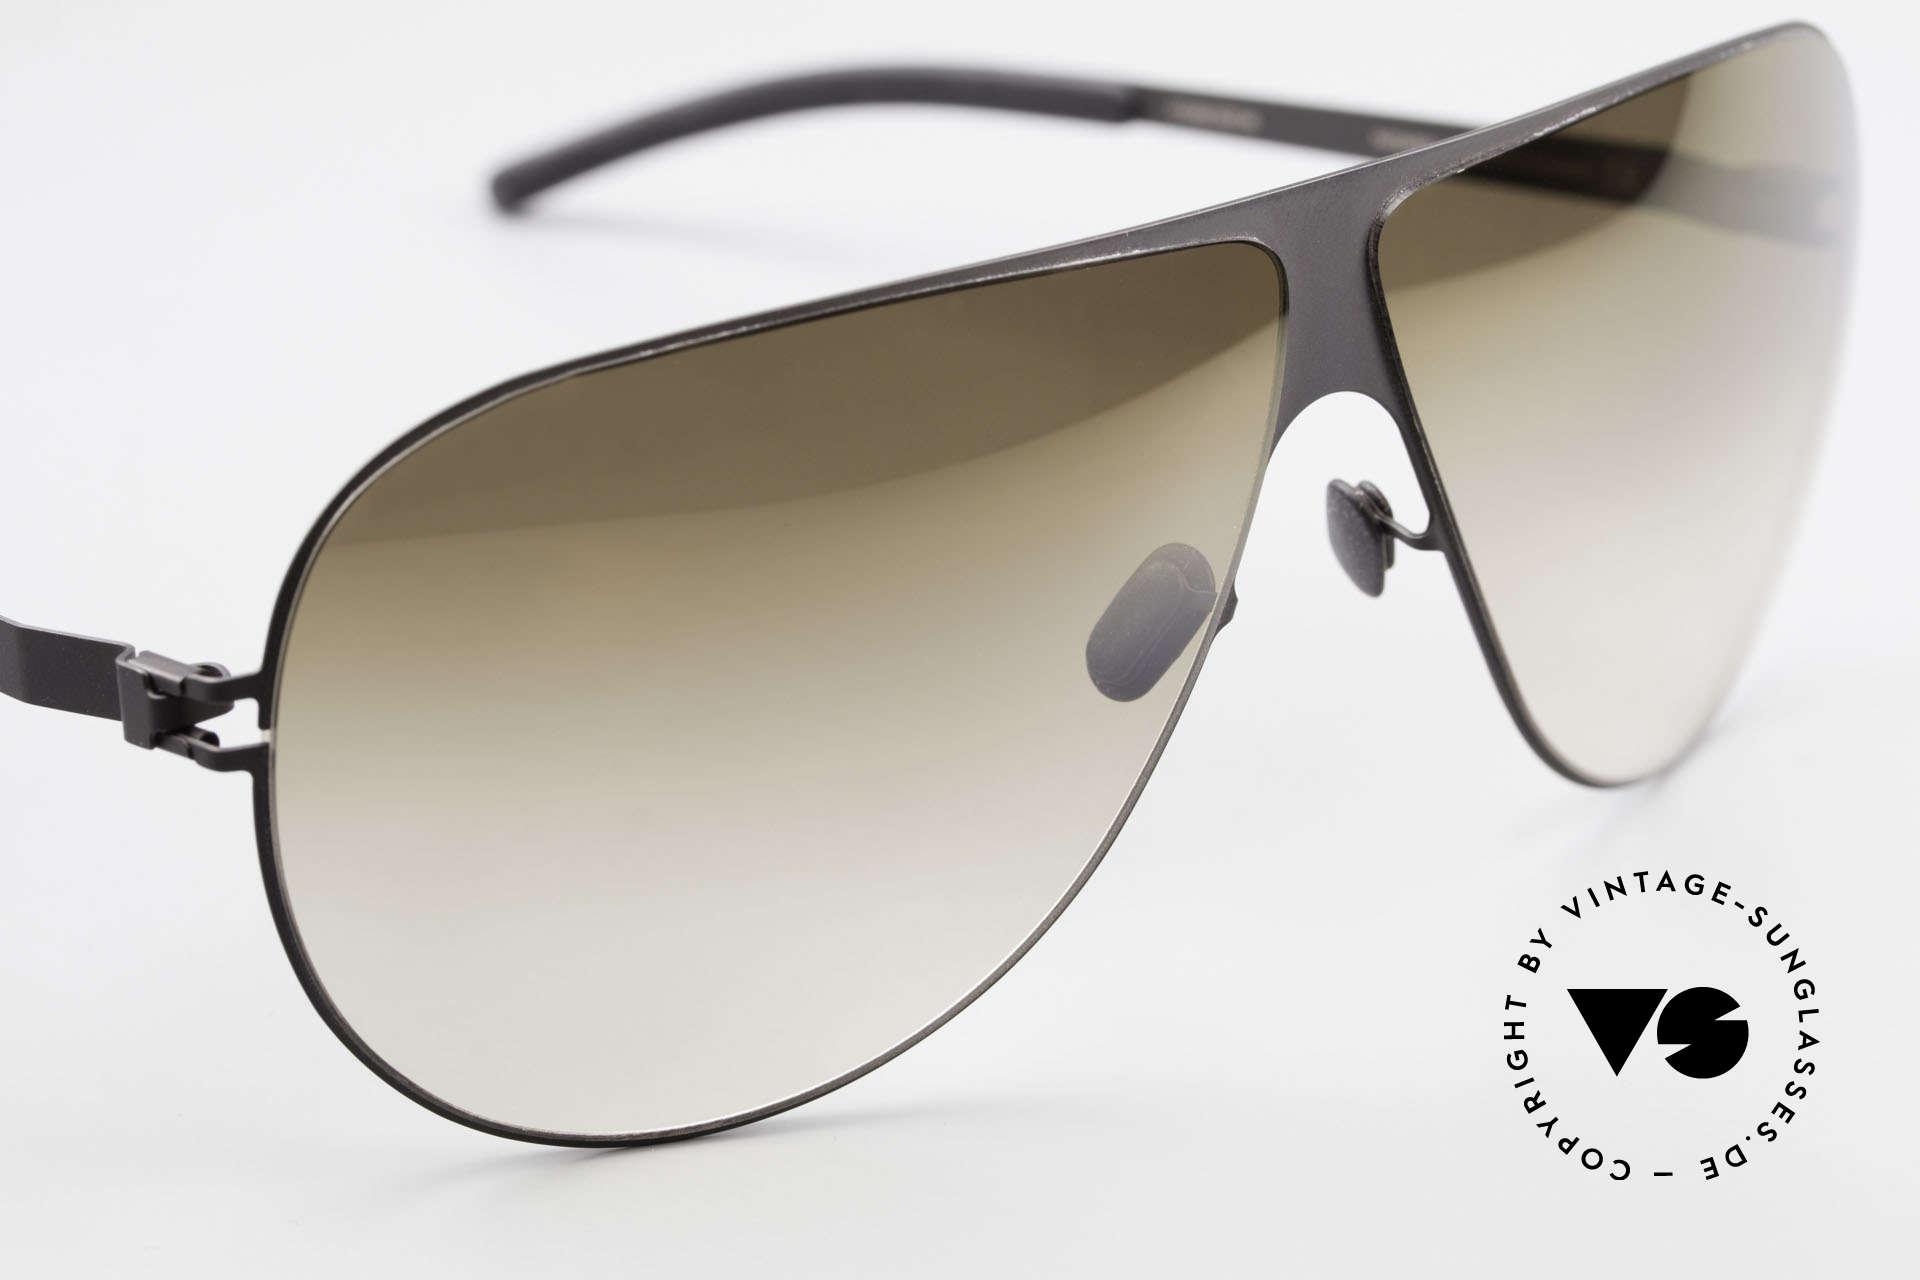 Mykita Elliot Mykita Tom Cruise Sonnenbrille, enorm hochwertig; made in Germany (Berlin-Kreuzberg), Passend für Herren